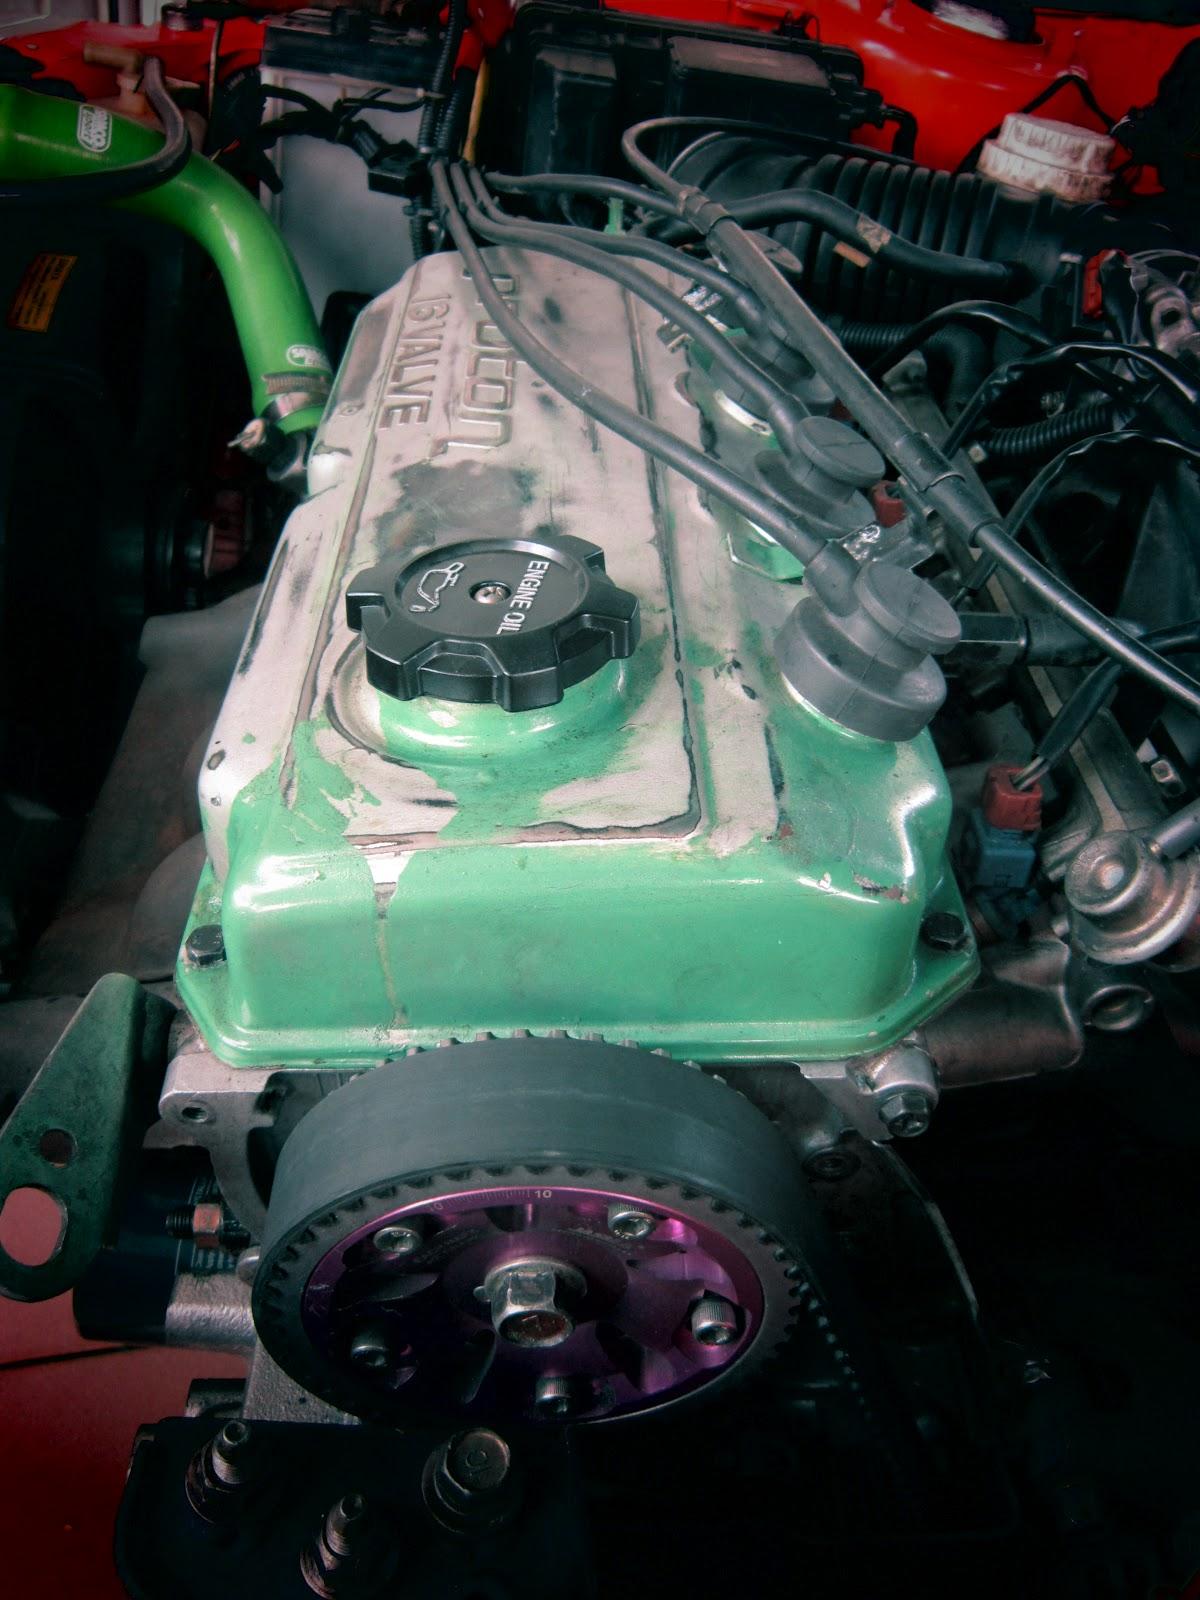 Diy 4g92 Sohc Valve Clearance Setting Wirahybrid Mitsubishi Wiring Diagram Remove Spark Plug Cables